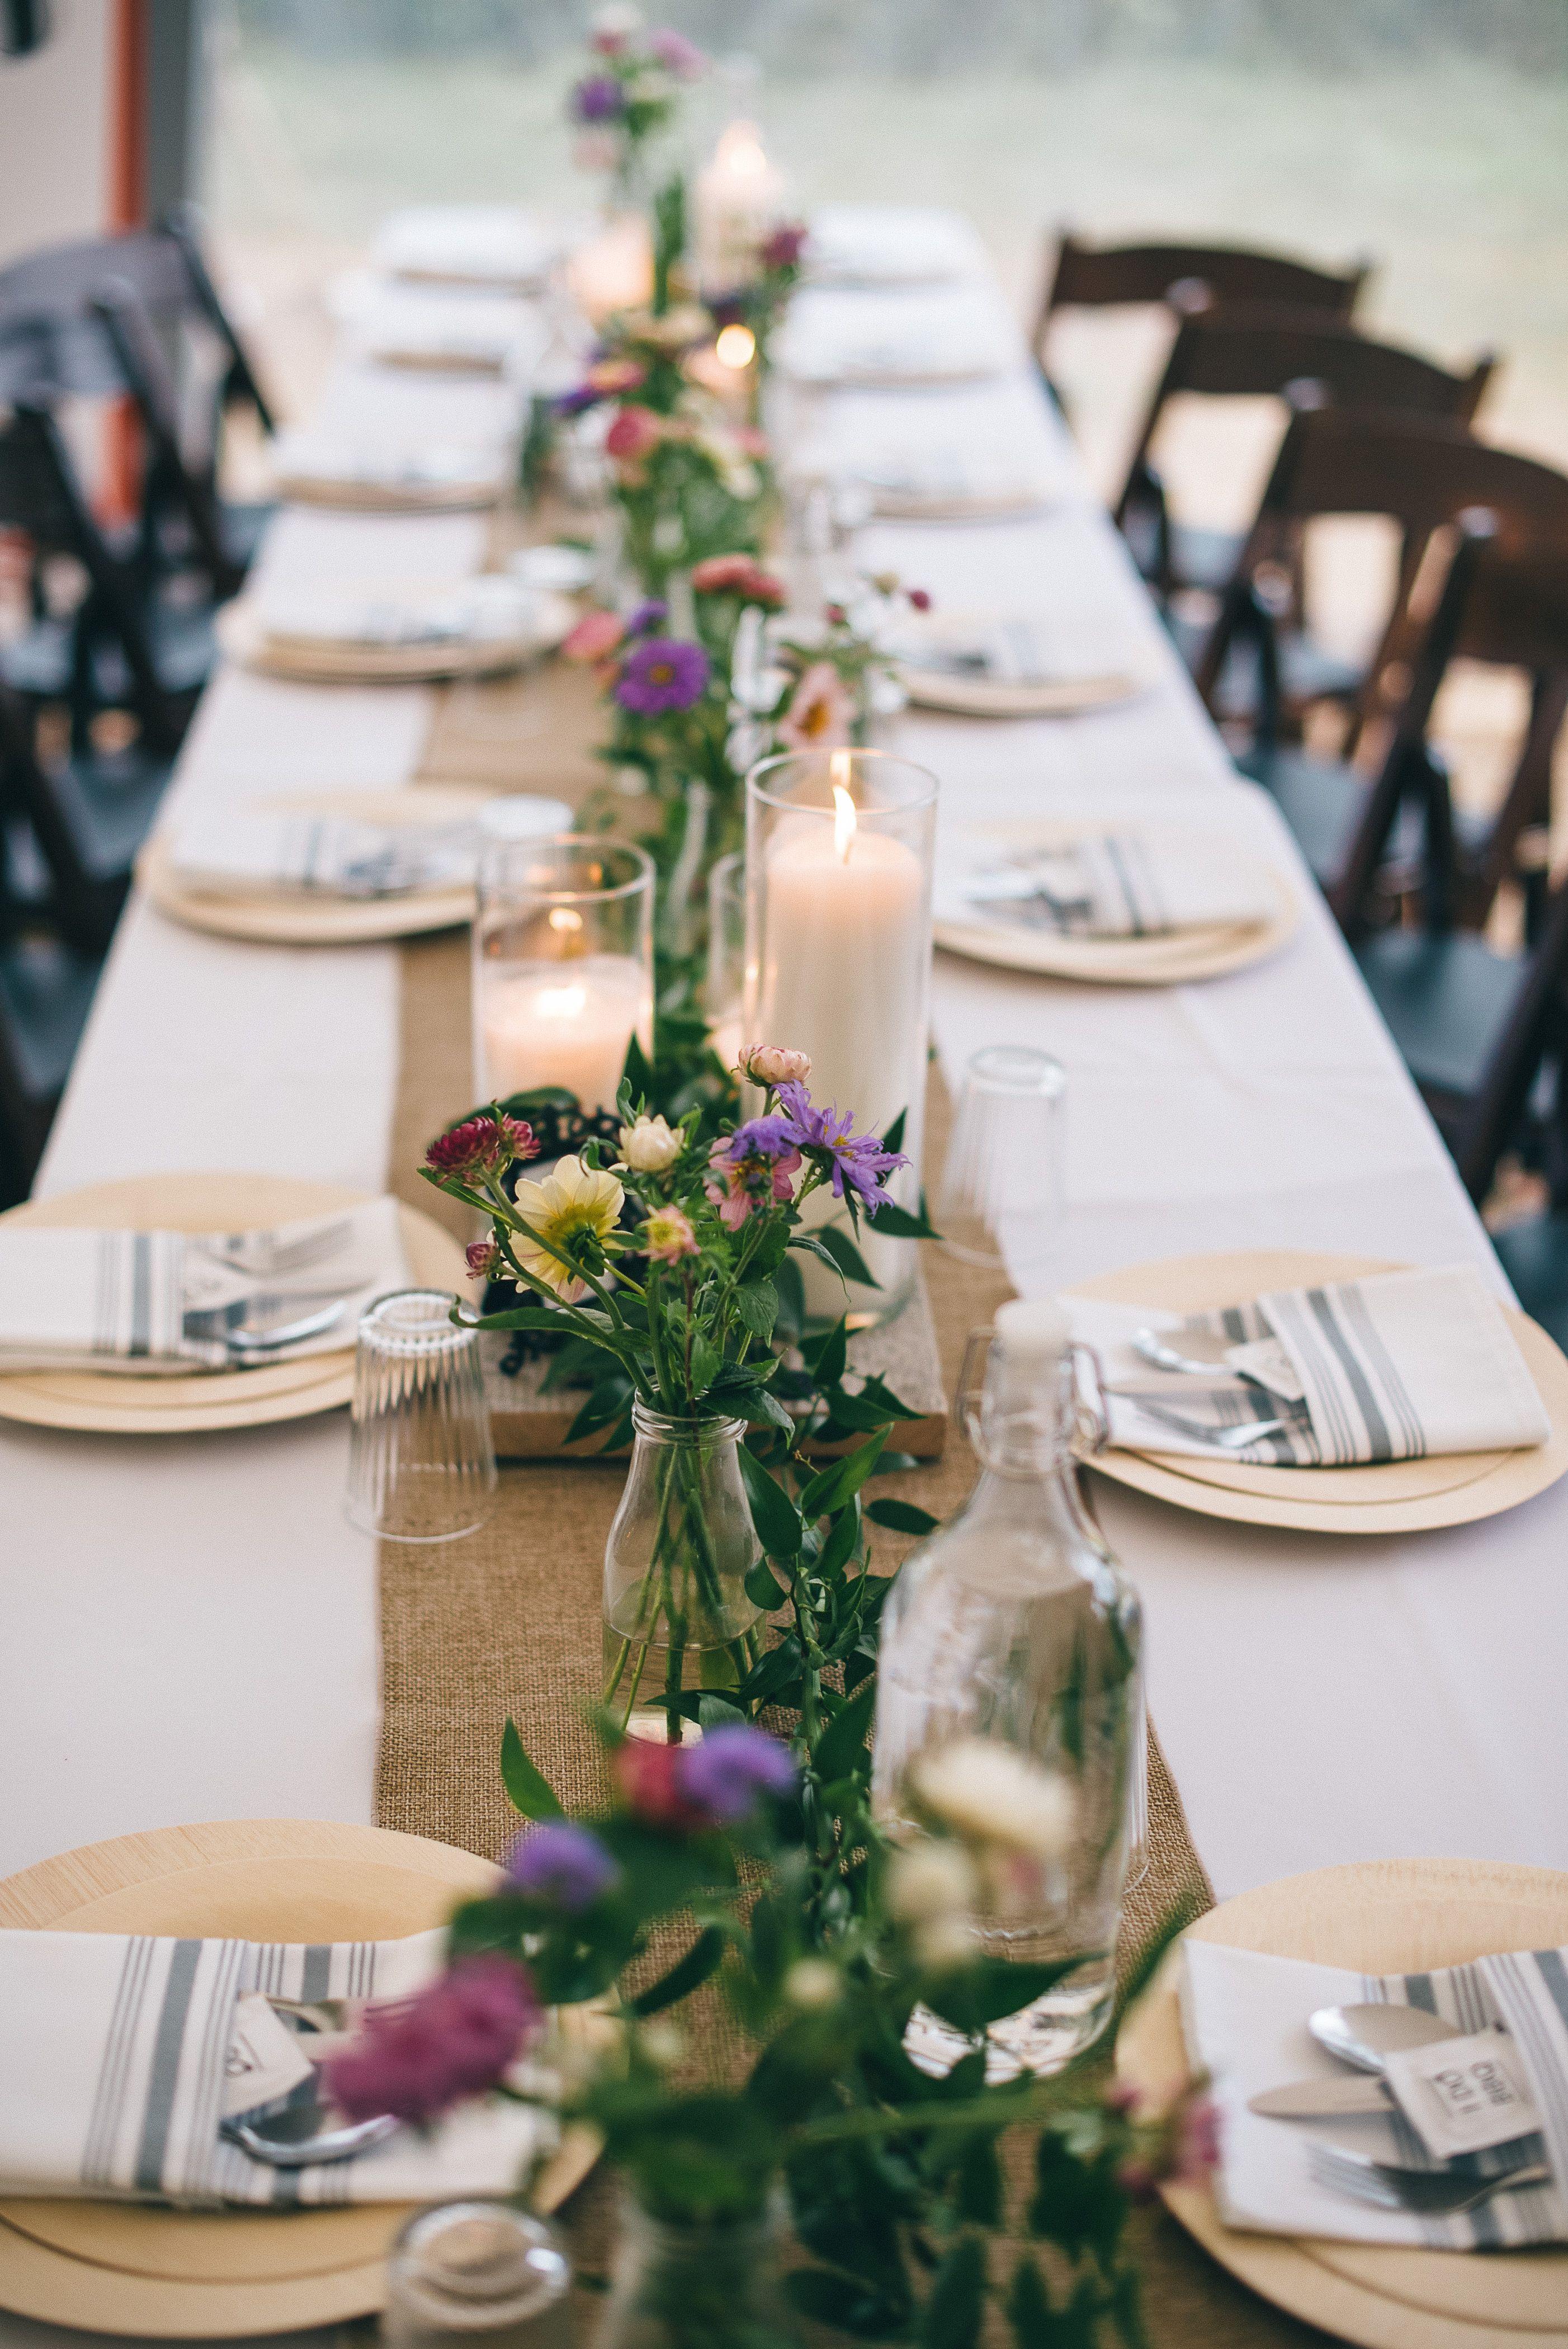 DIY Rustic Farm Wedding, Rustic Table Setting, Farm Tables, Farm Wed…    Wedding reception table decorations, Reception table decorations, Rustic  wedding table decor